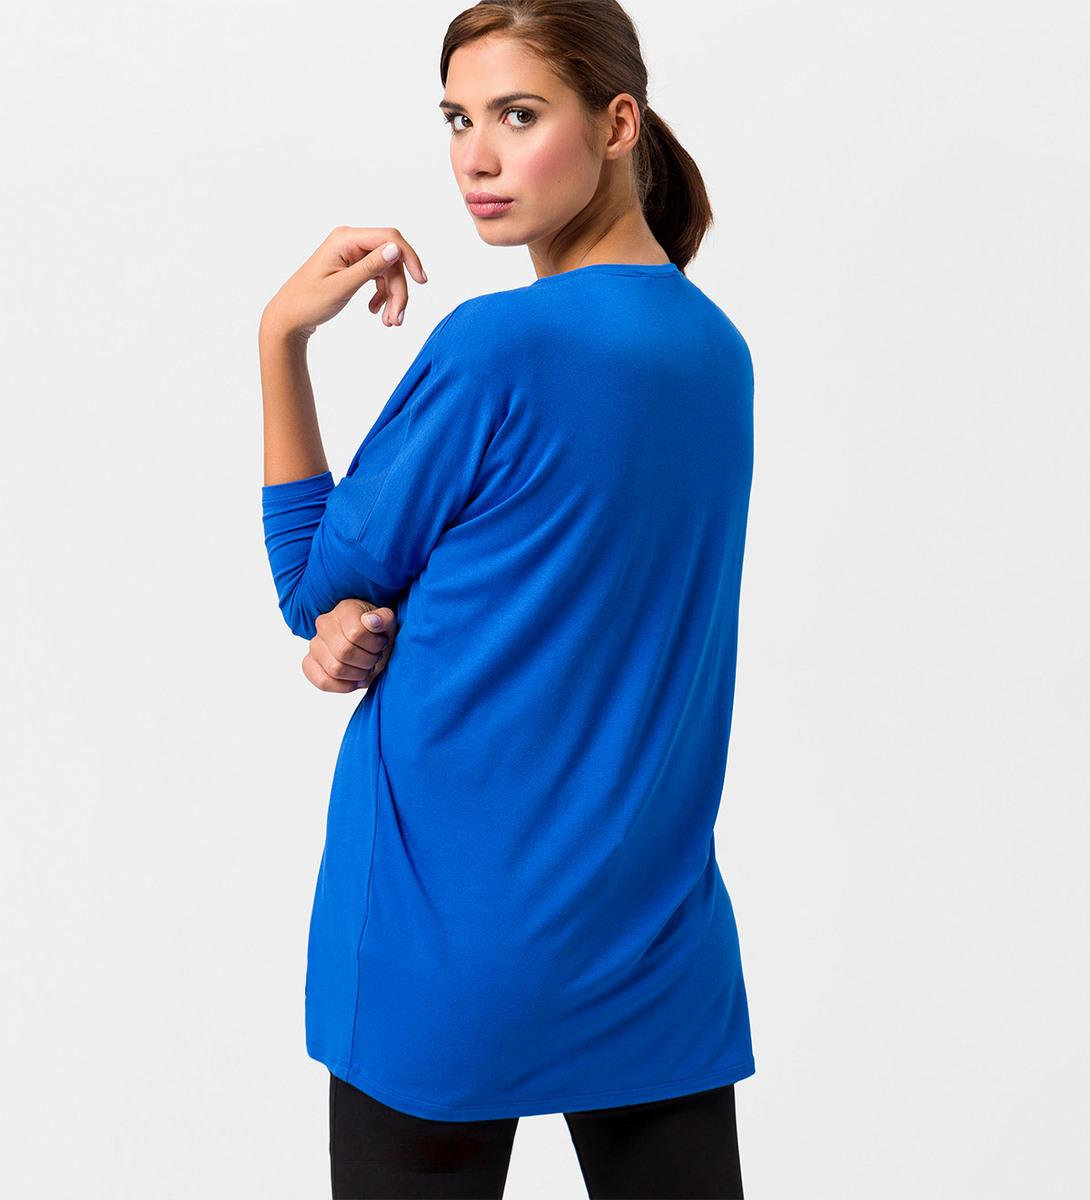 Jersey Cardigan in Oversize-Passform in cobalt blue